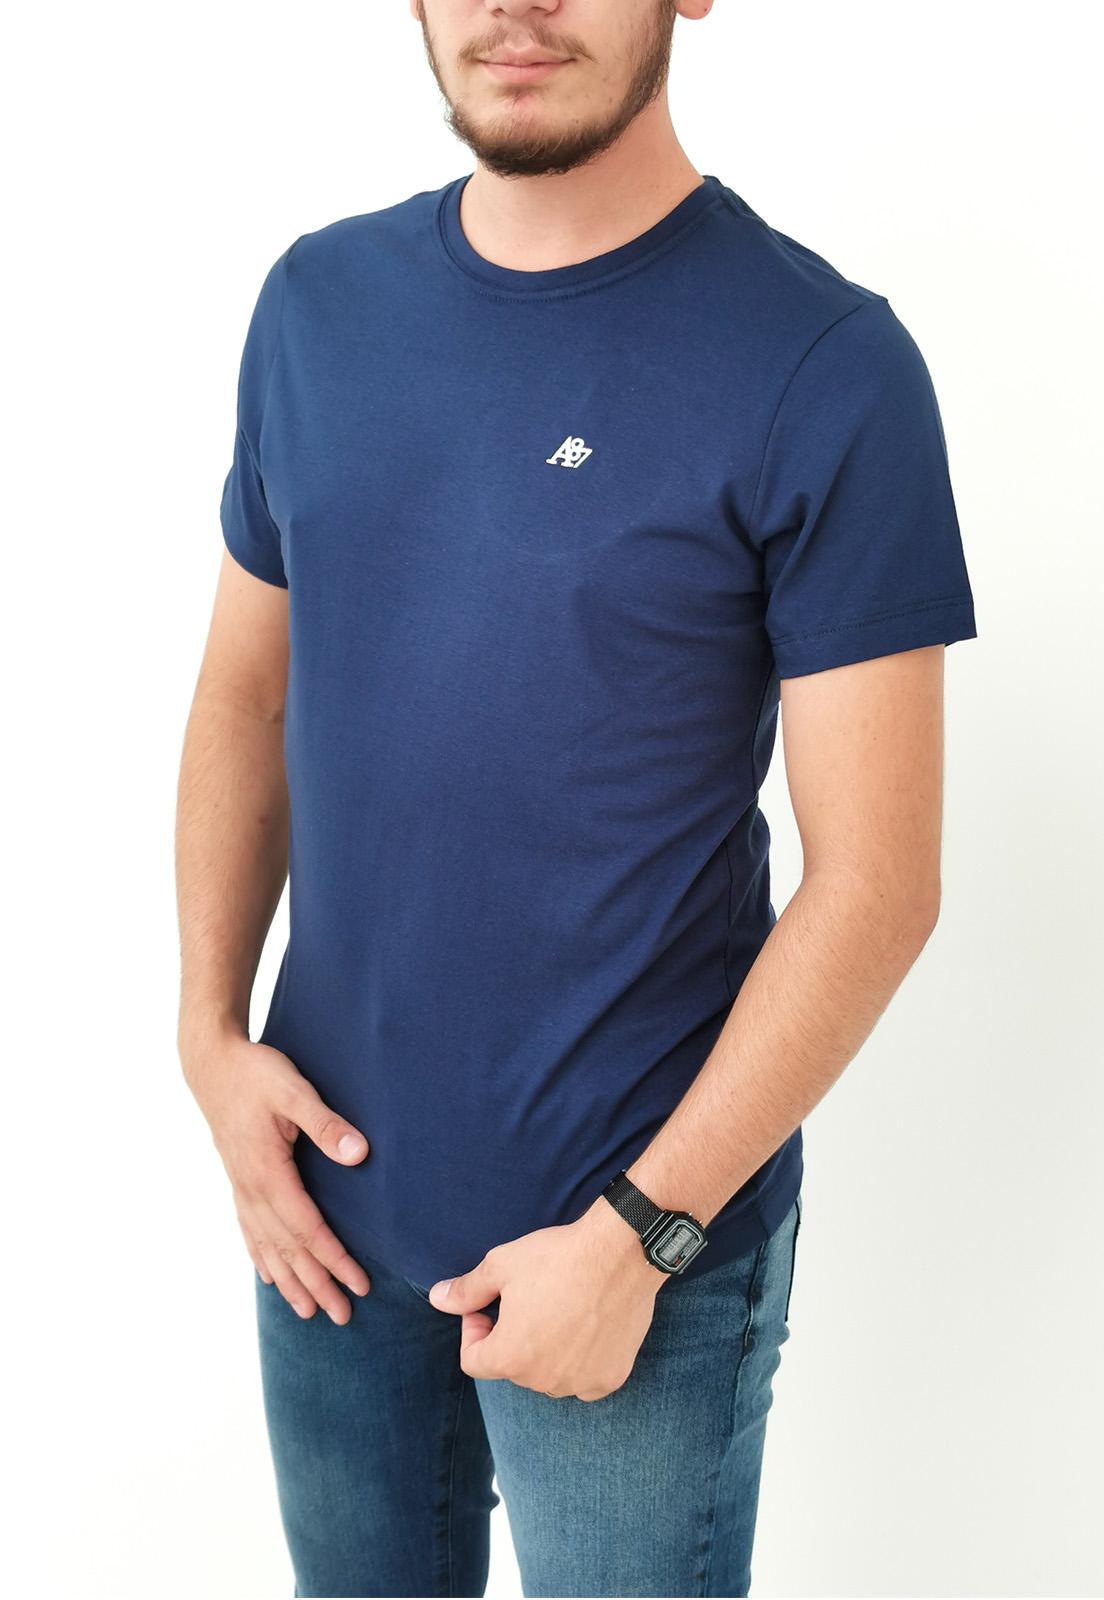 Camiseta Aéropostale Básica Slim Azul Marinho